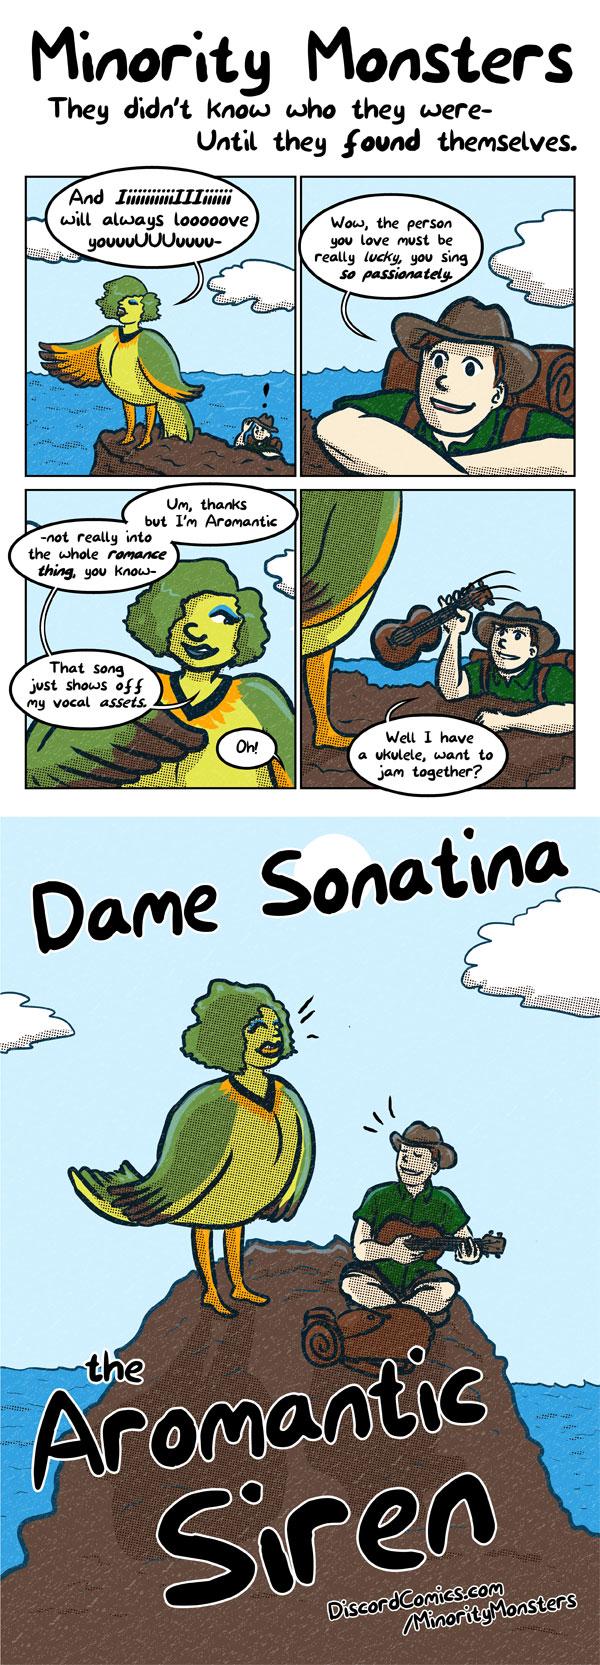 10-Dame-Sonatina